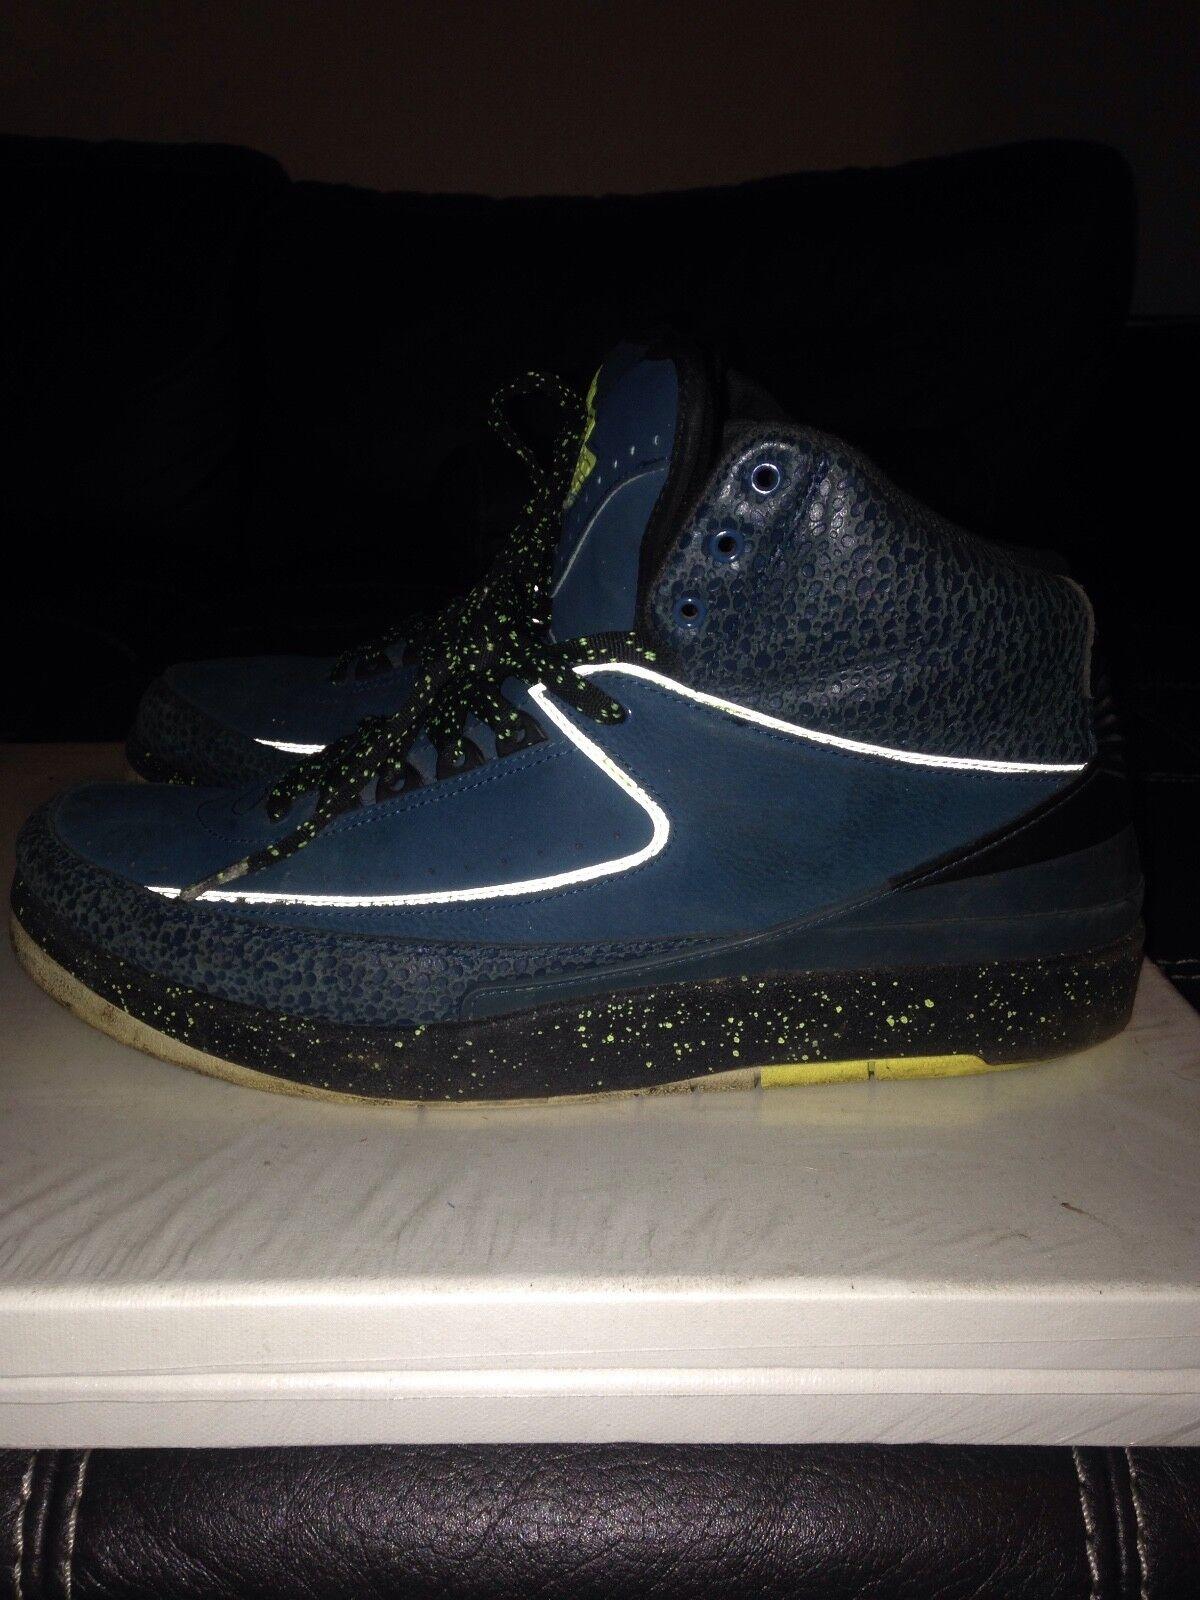 Nike air jordan ii retro nightshade usato taglia 12 385475-303